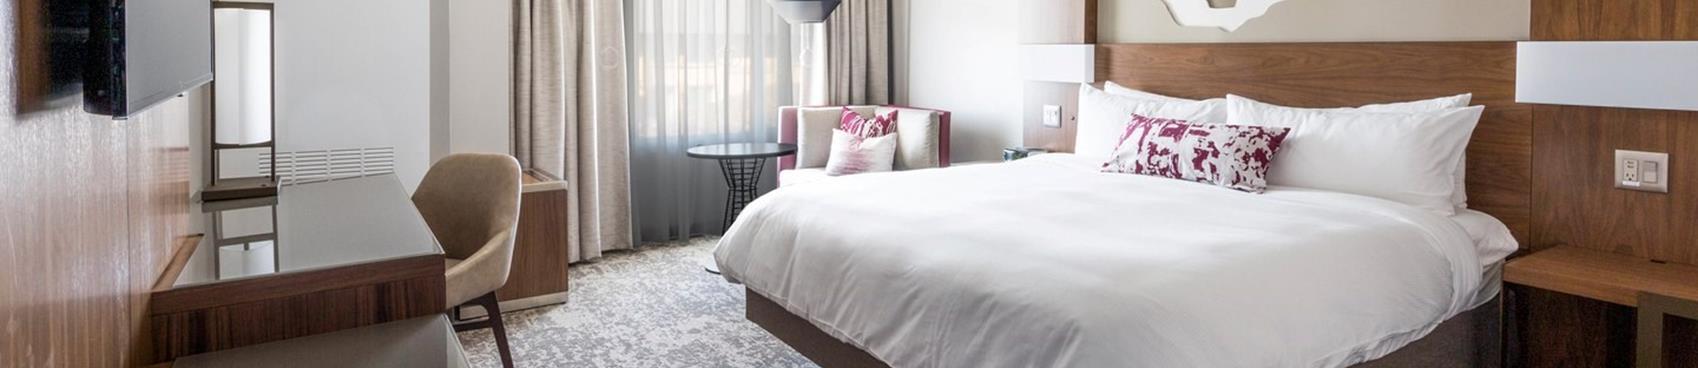 Napa Valley Marriott Hotel & Spa